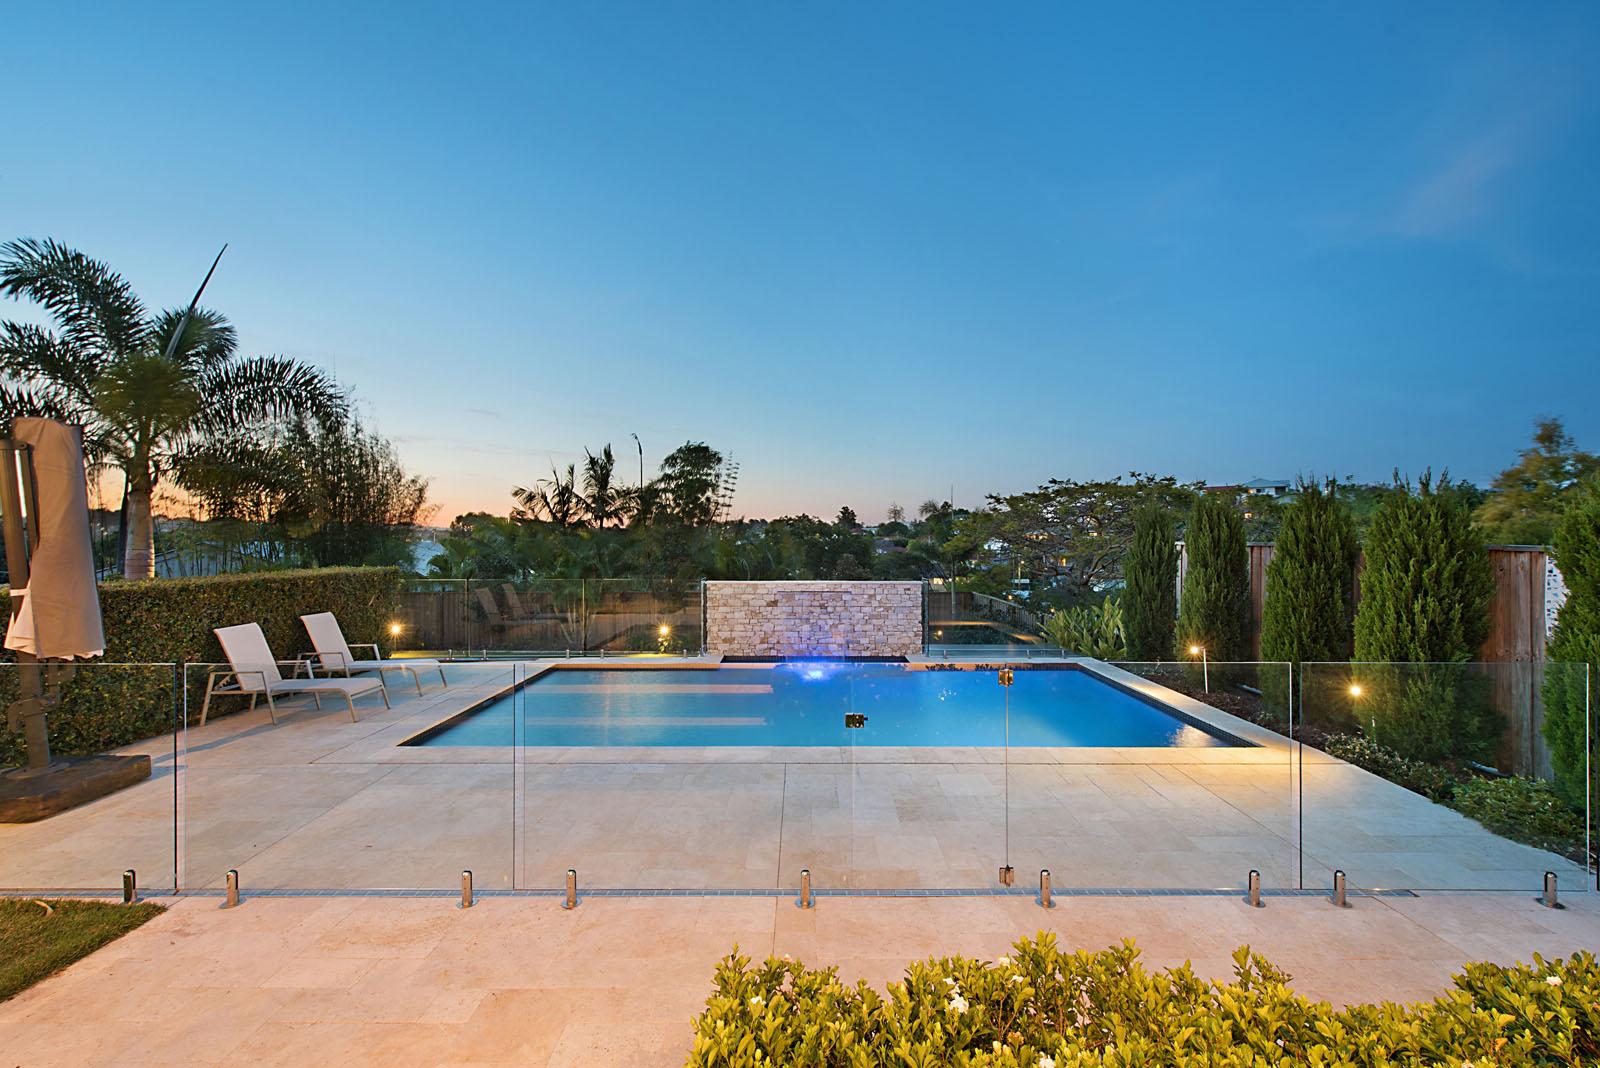 Gordon Park Landscaping Brisbane Amp Pool Design